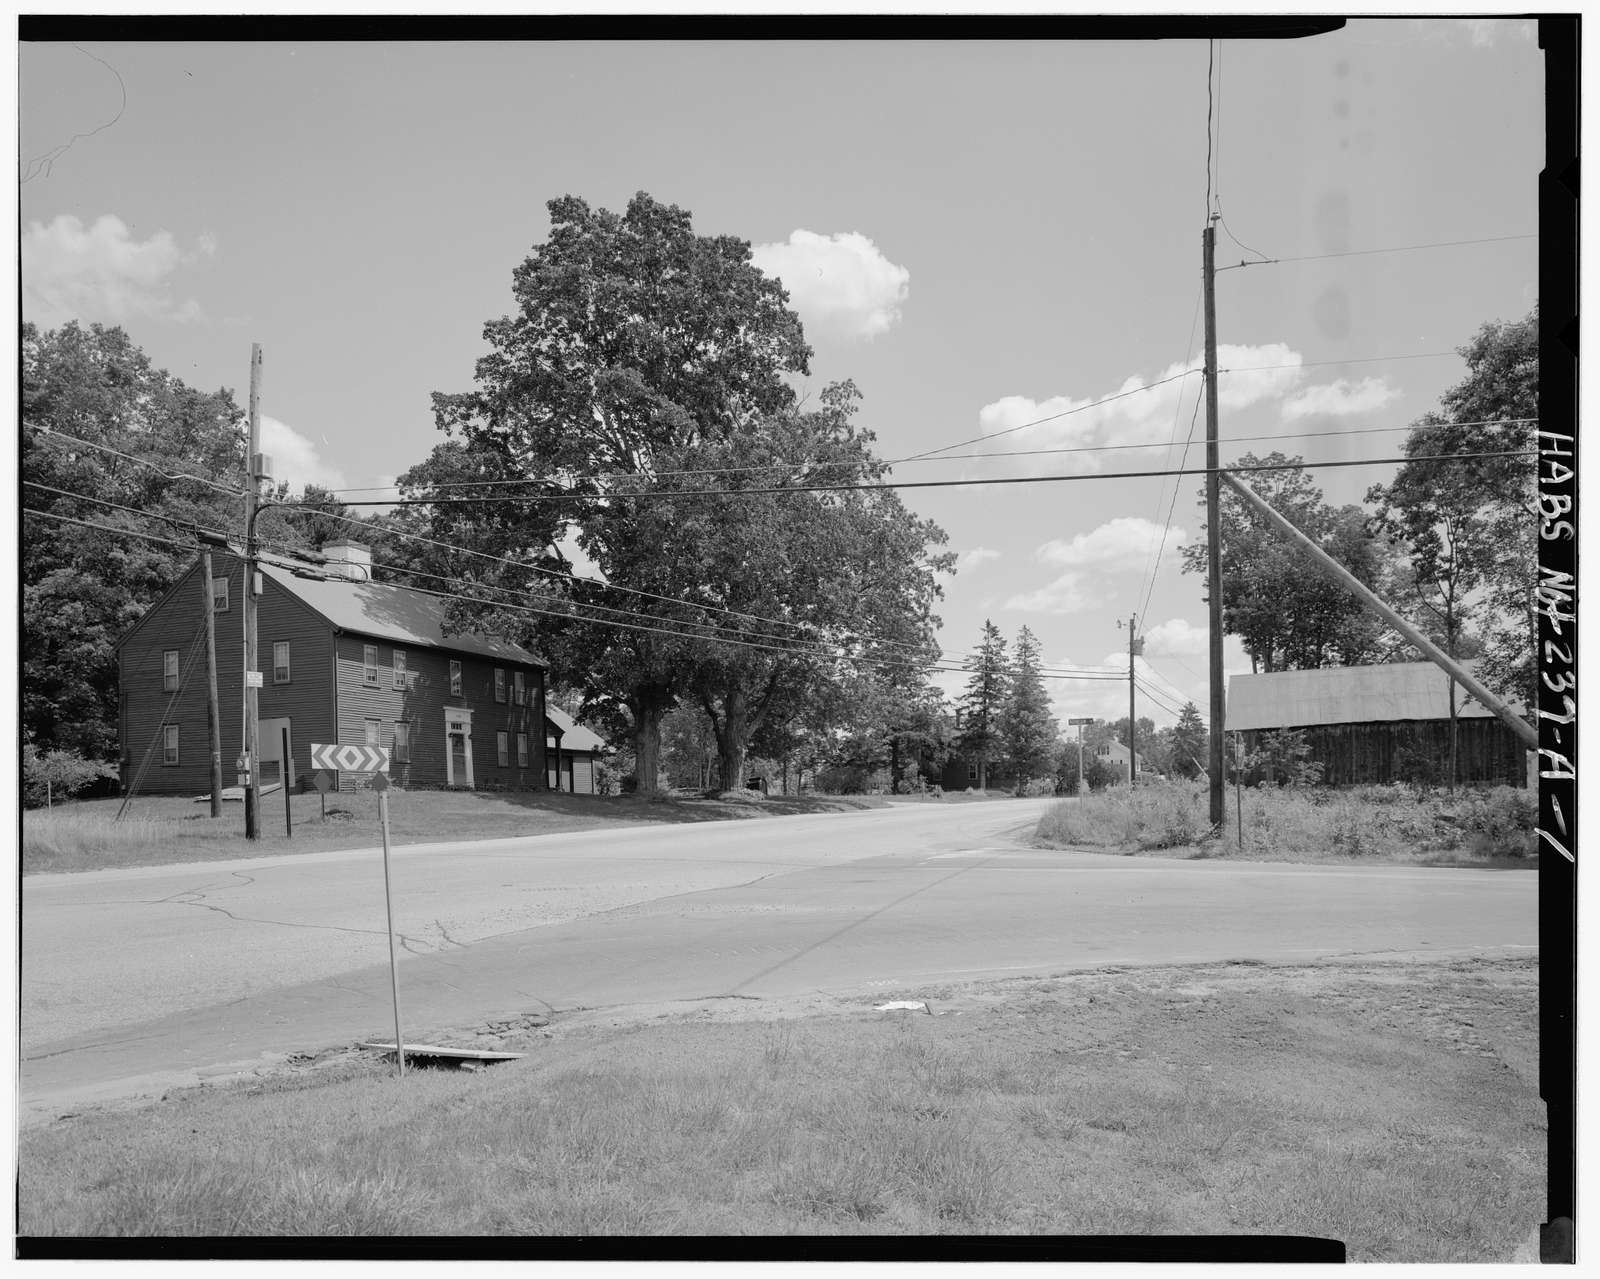 Batchelder-Edgerly Farmstead, Barn, U.S. Route 4, southwest side, southeast corner of New Hampshire Route 43, Northwood, Rockingham County, NH